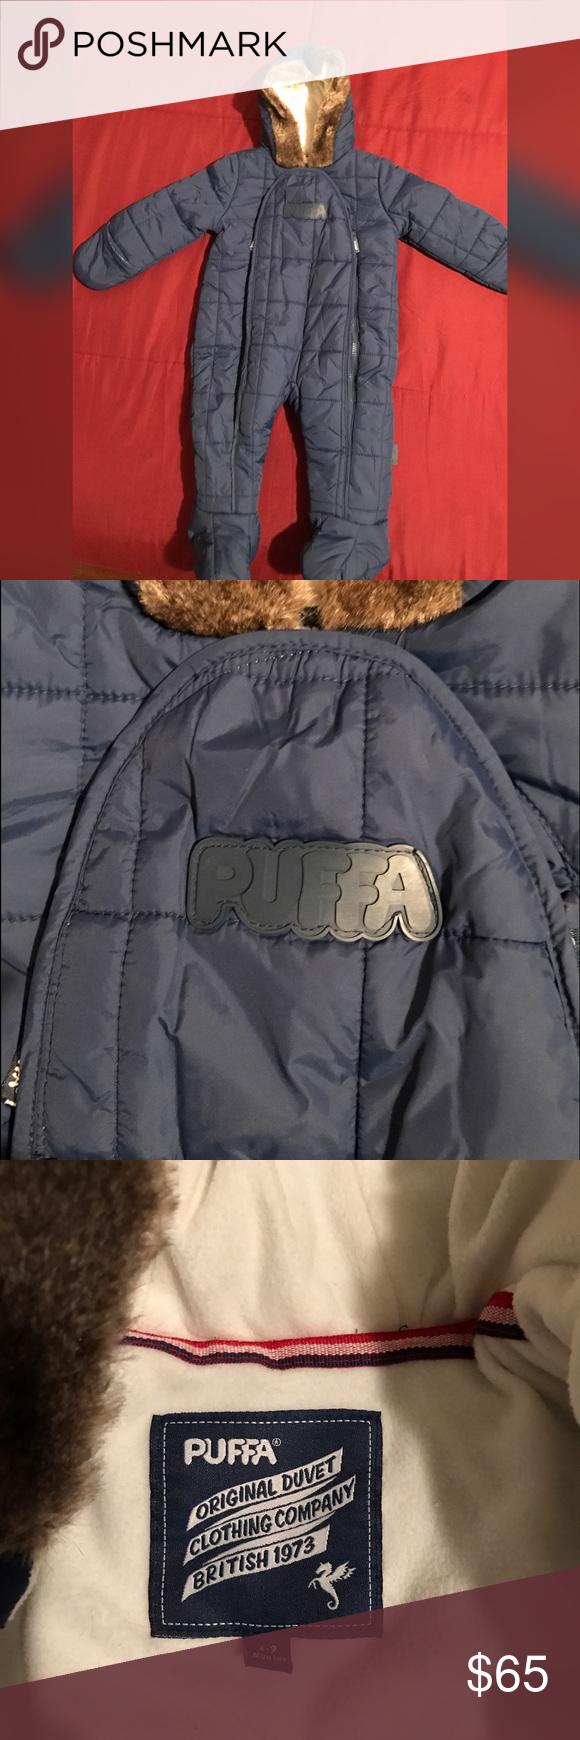 012ba8cf0d8b NWOT PUFFA Baby Snowsuit Brand new authentic Puffa baby snowsuit ...